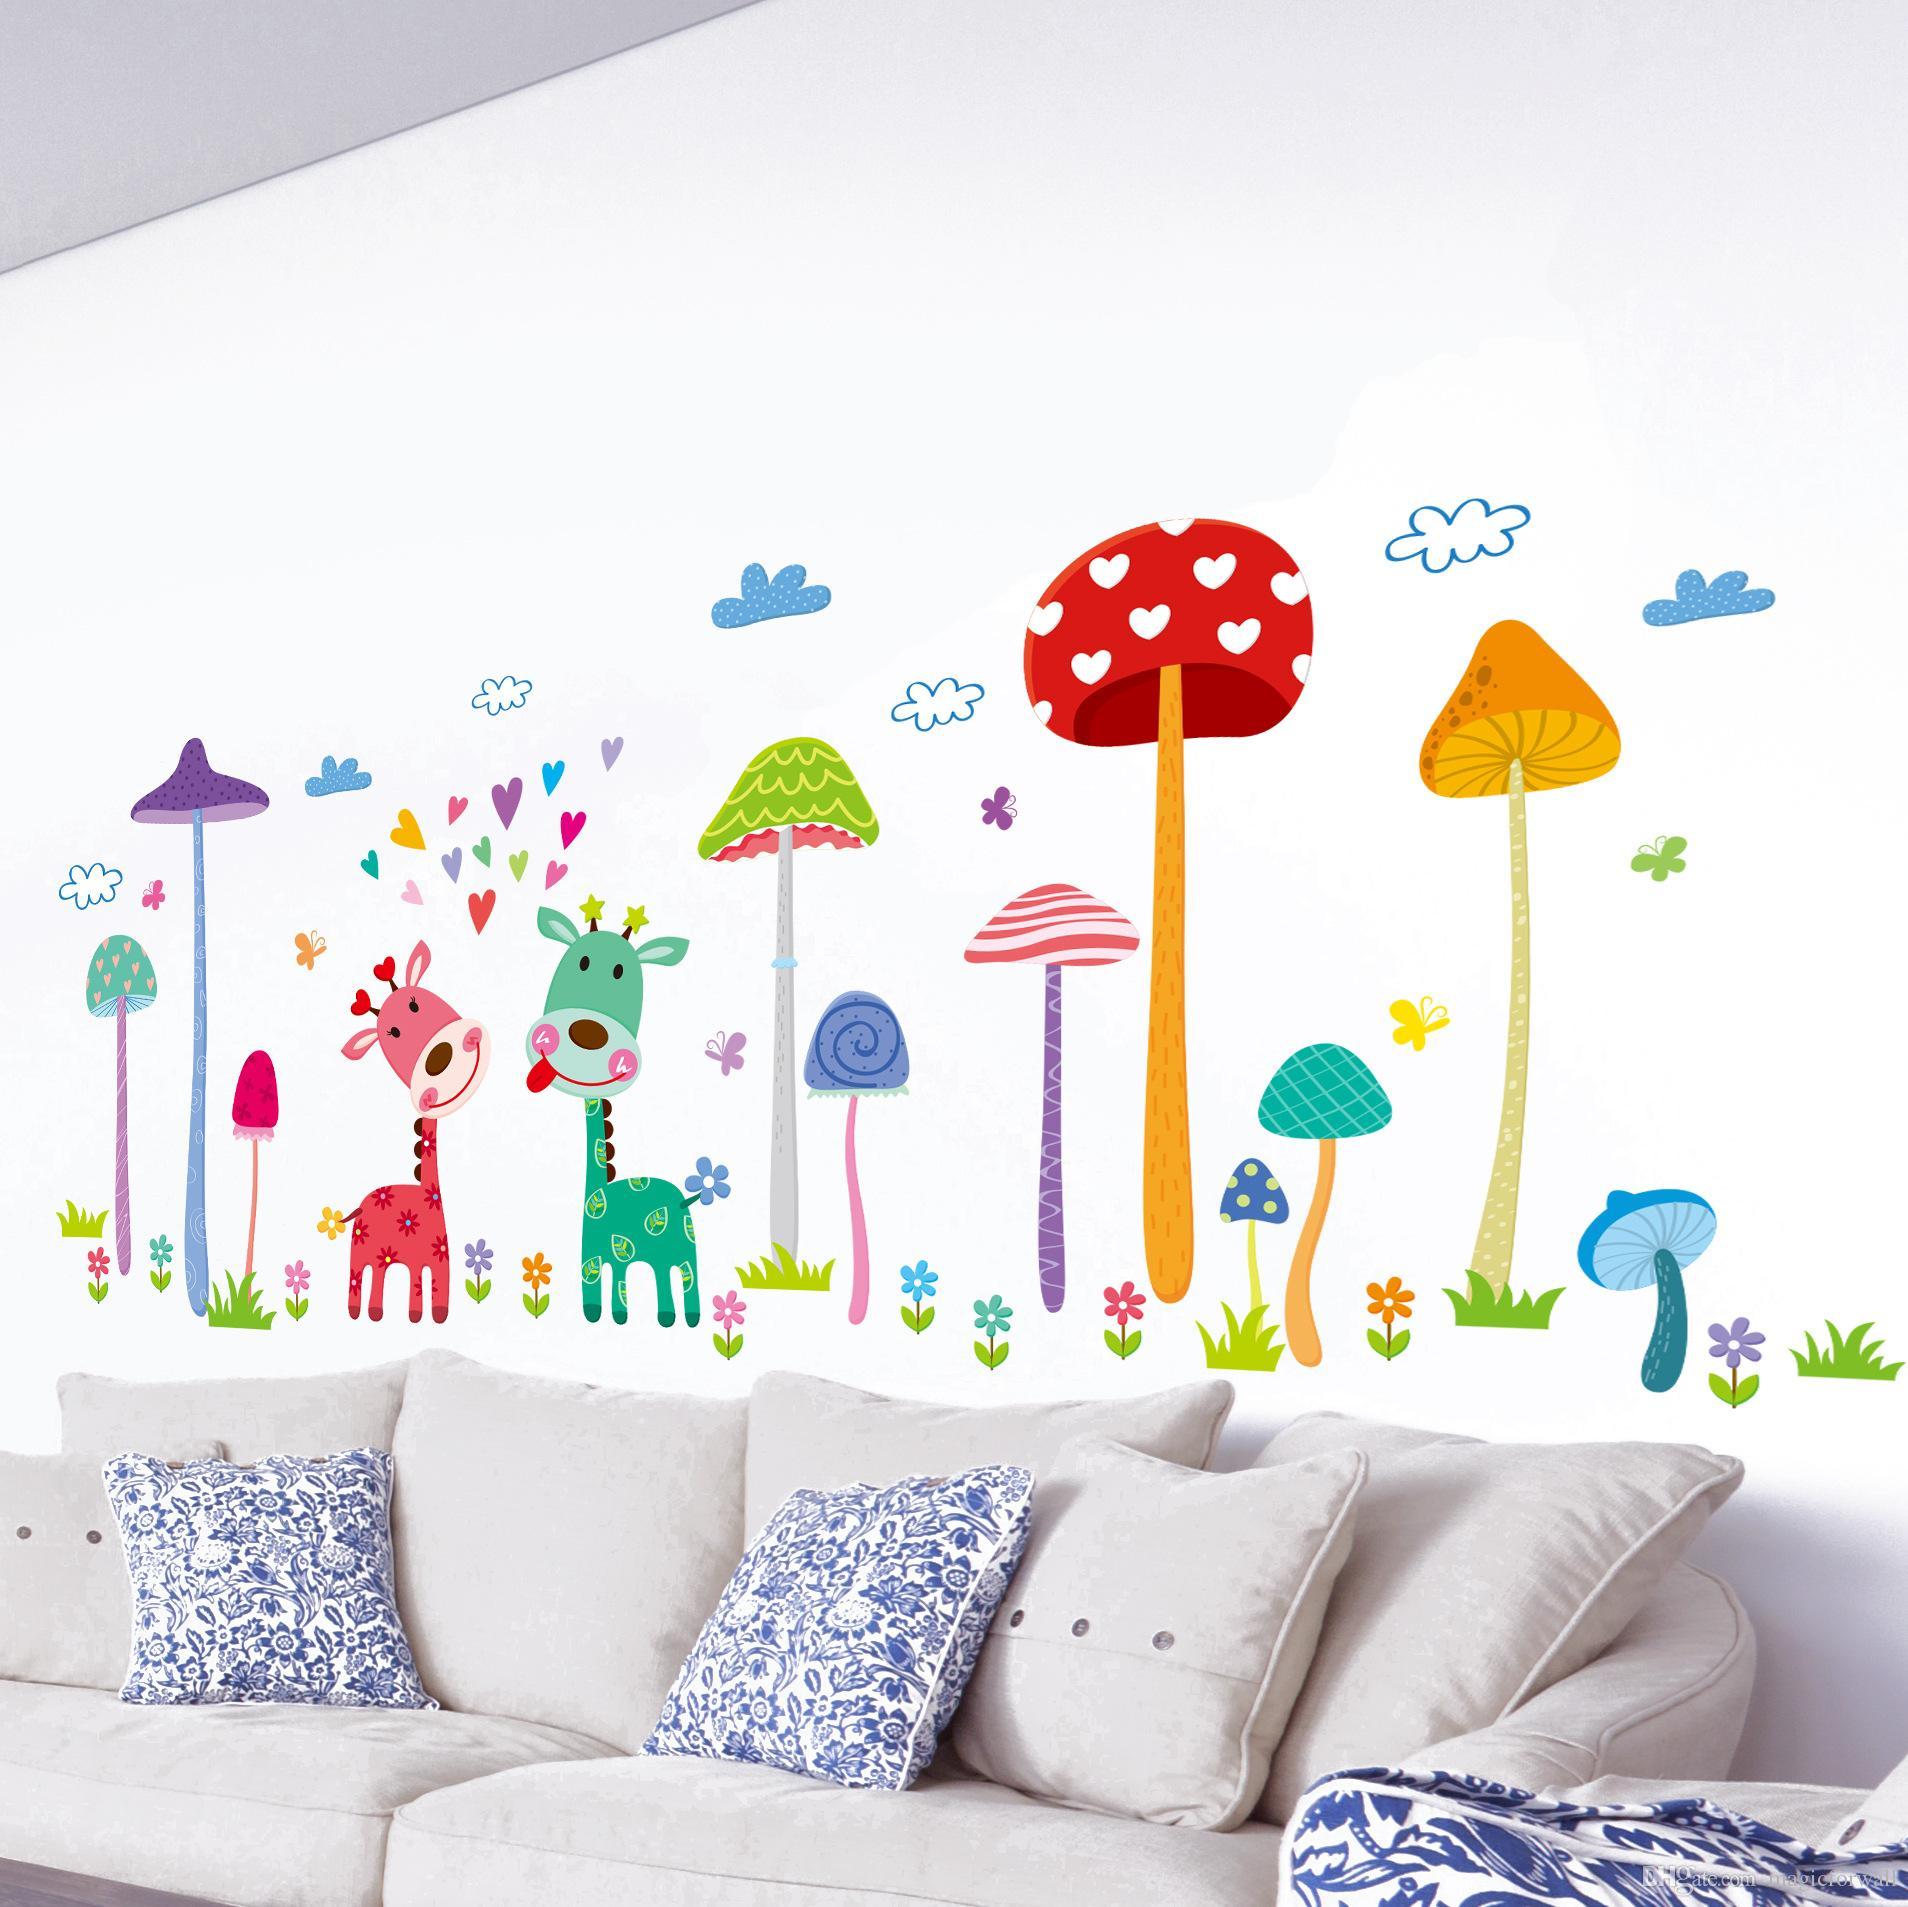 Kids Wall Decals Forest Mushroom Deer Animals Home Wall Art Mural Decor Kids Baby Room OHWUZEB